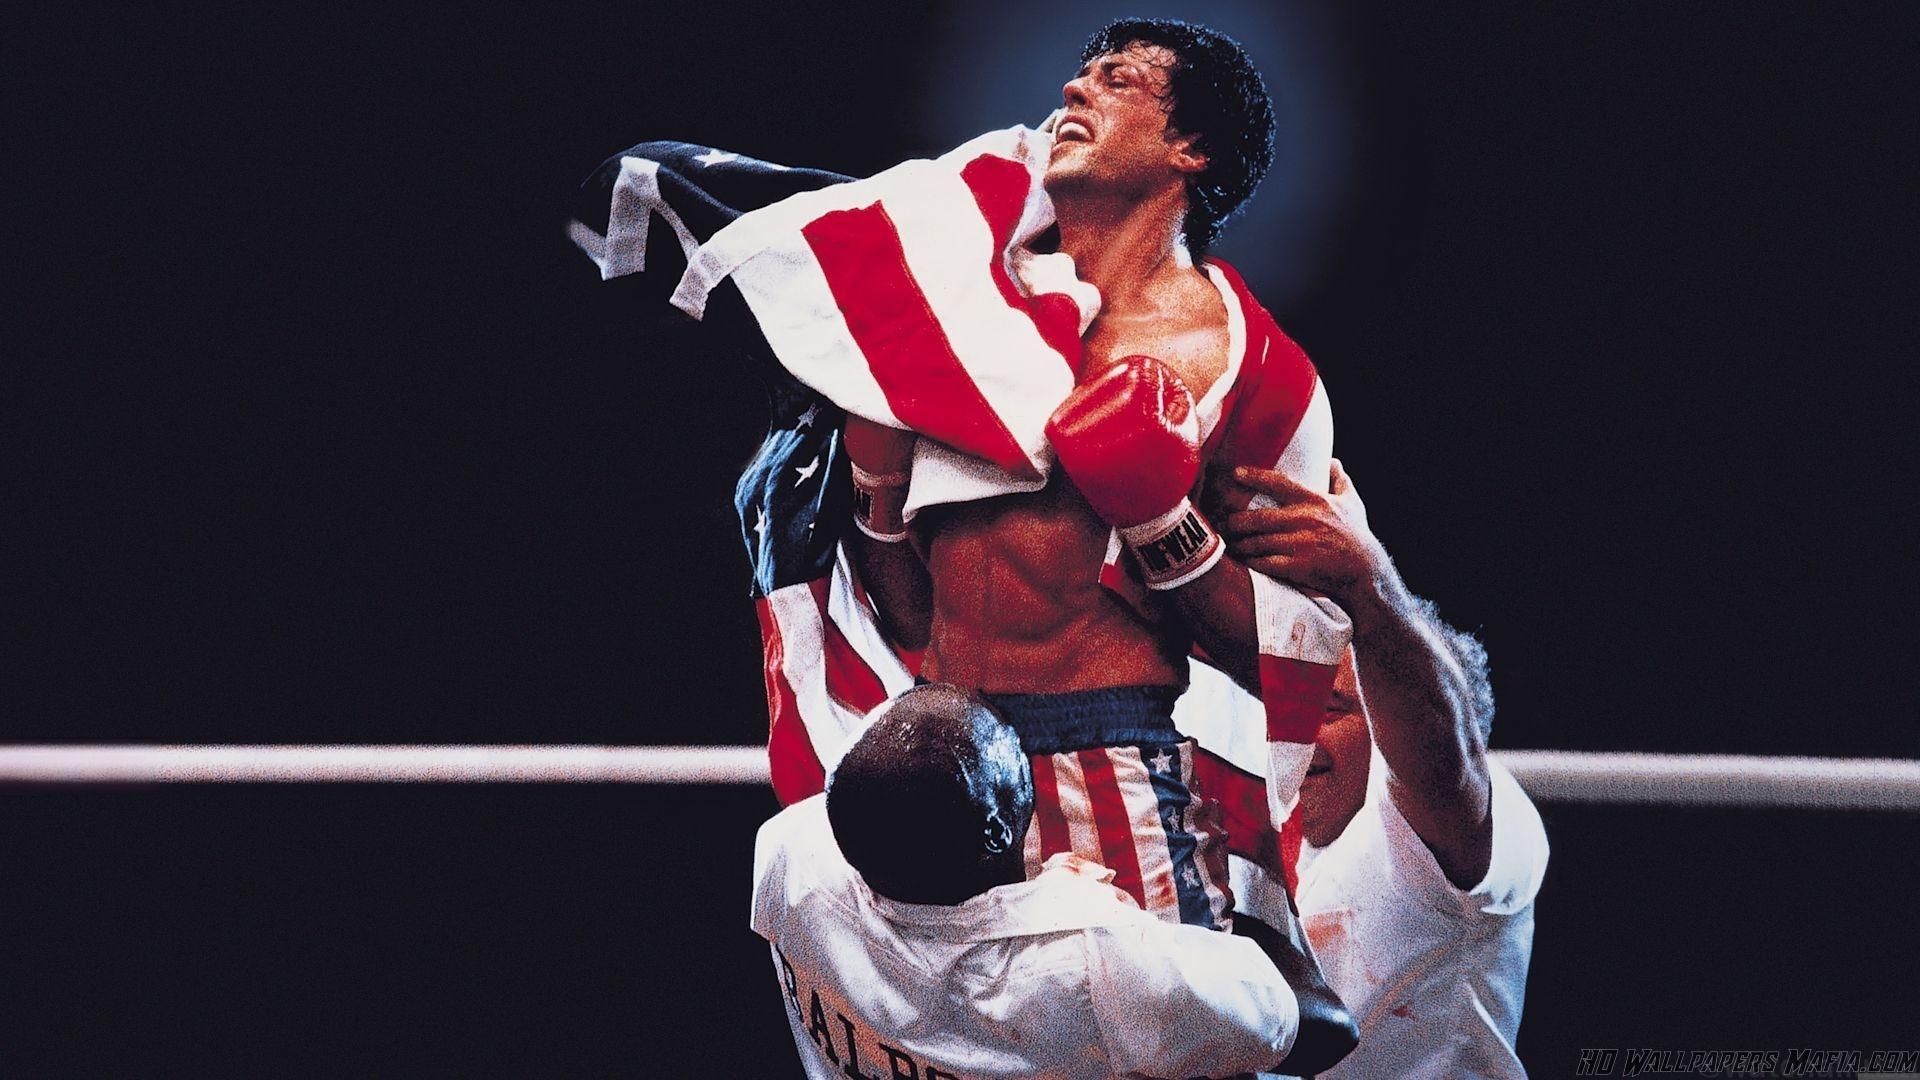 Rocky Balboa Hd Wallpaper 22 HD Wallpapers Mafia 1920x1080